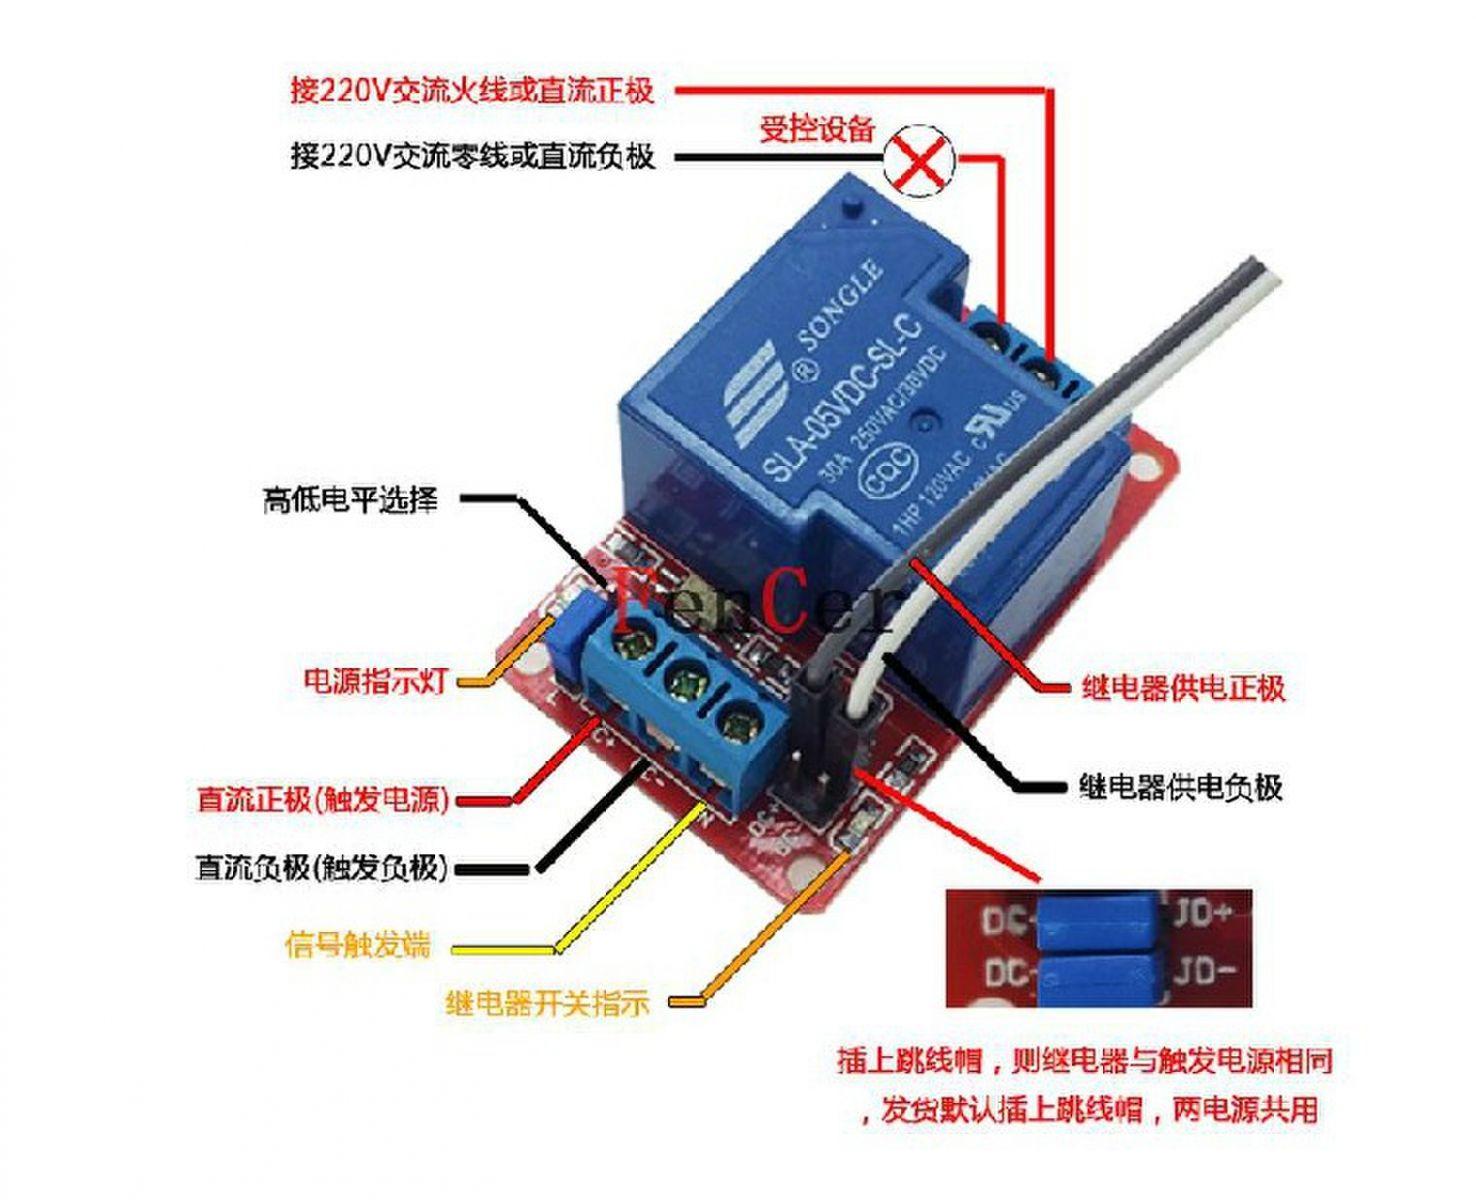 30a 24v relay wiring diagram circuit diagram maker 24 Volt Relay Wiring Relay Switch Wiring Diagram